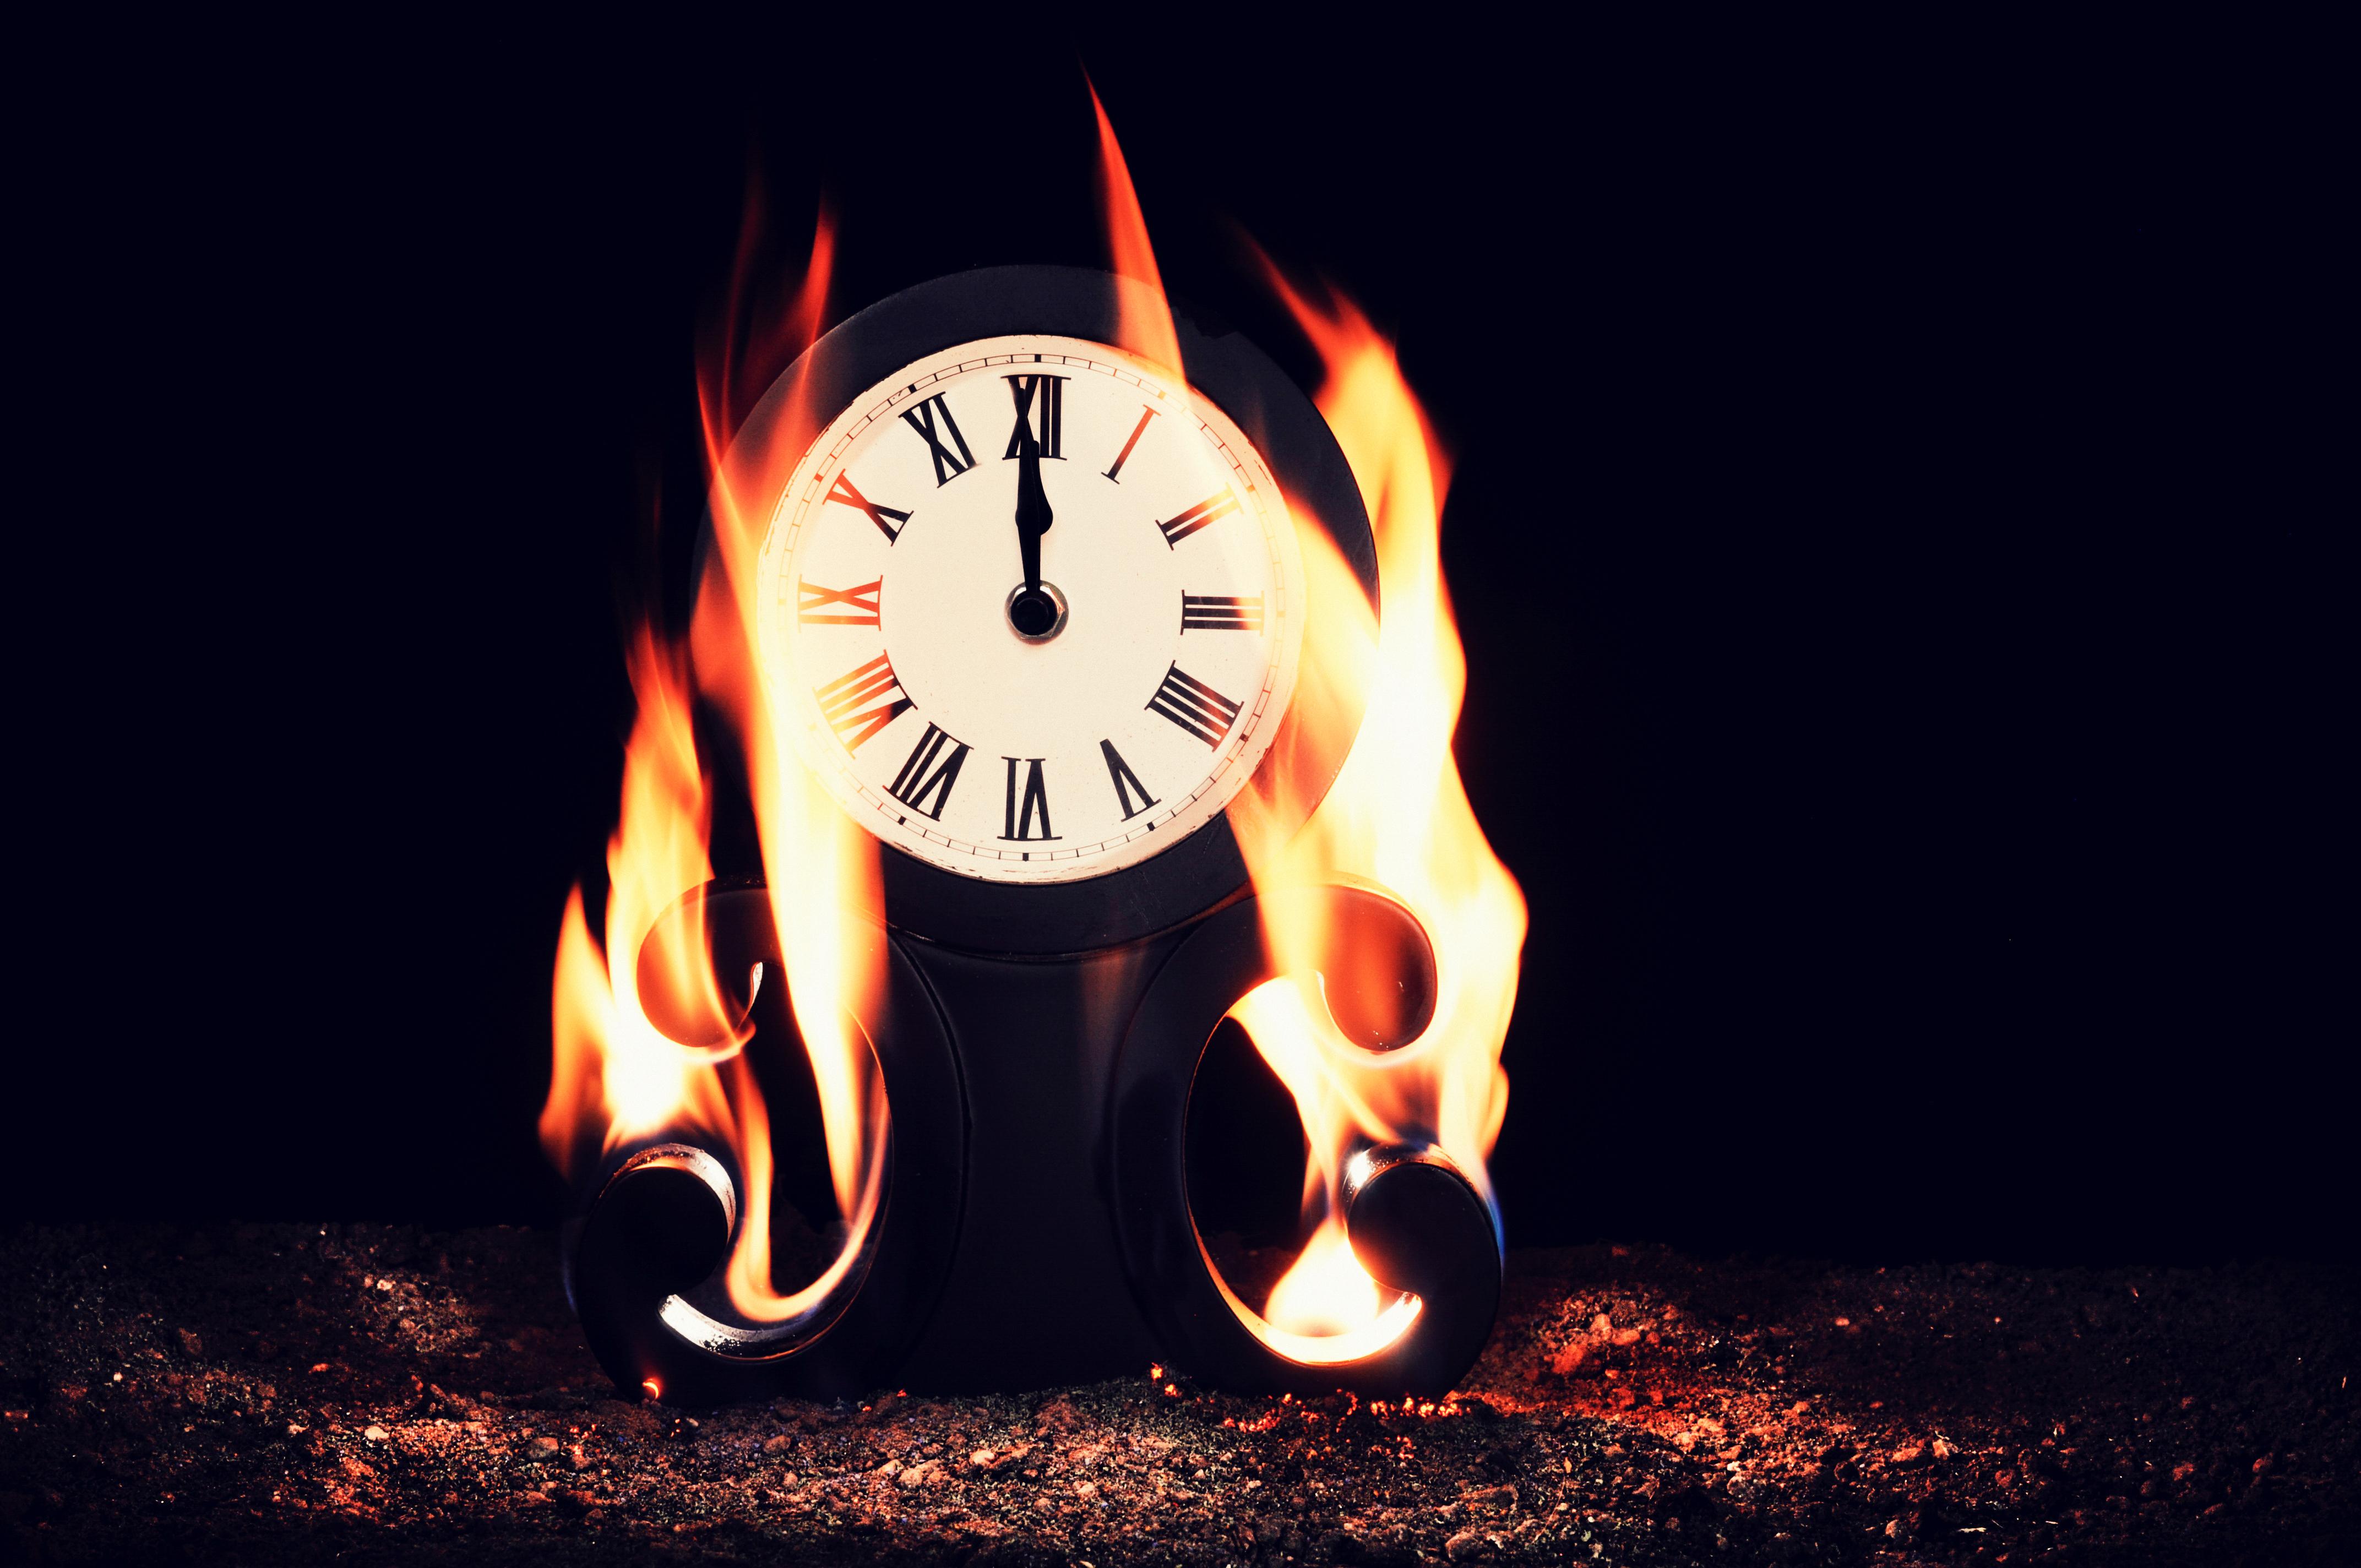 doomsday clock 3 11 59